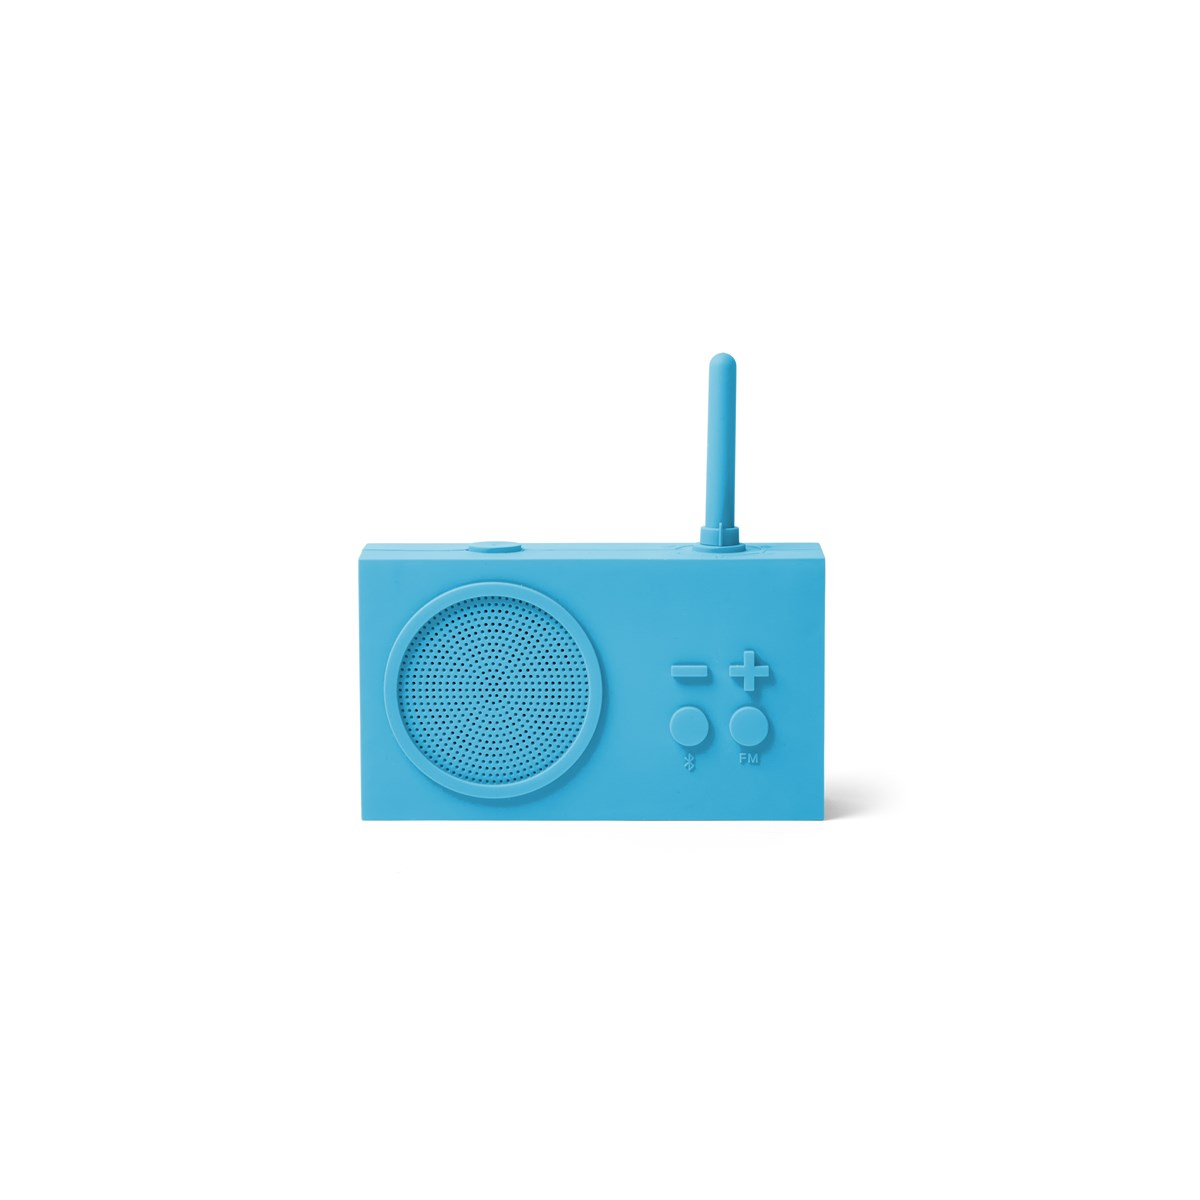 Enceinte Bluetooth et Radio en Gomme Bleu turquoise